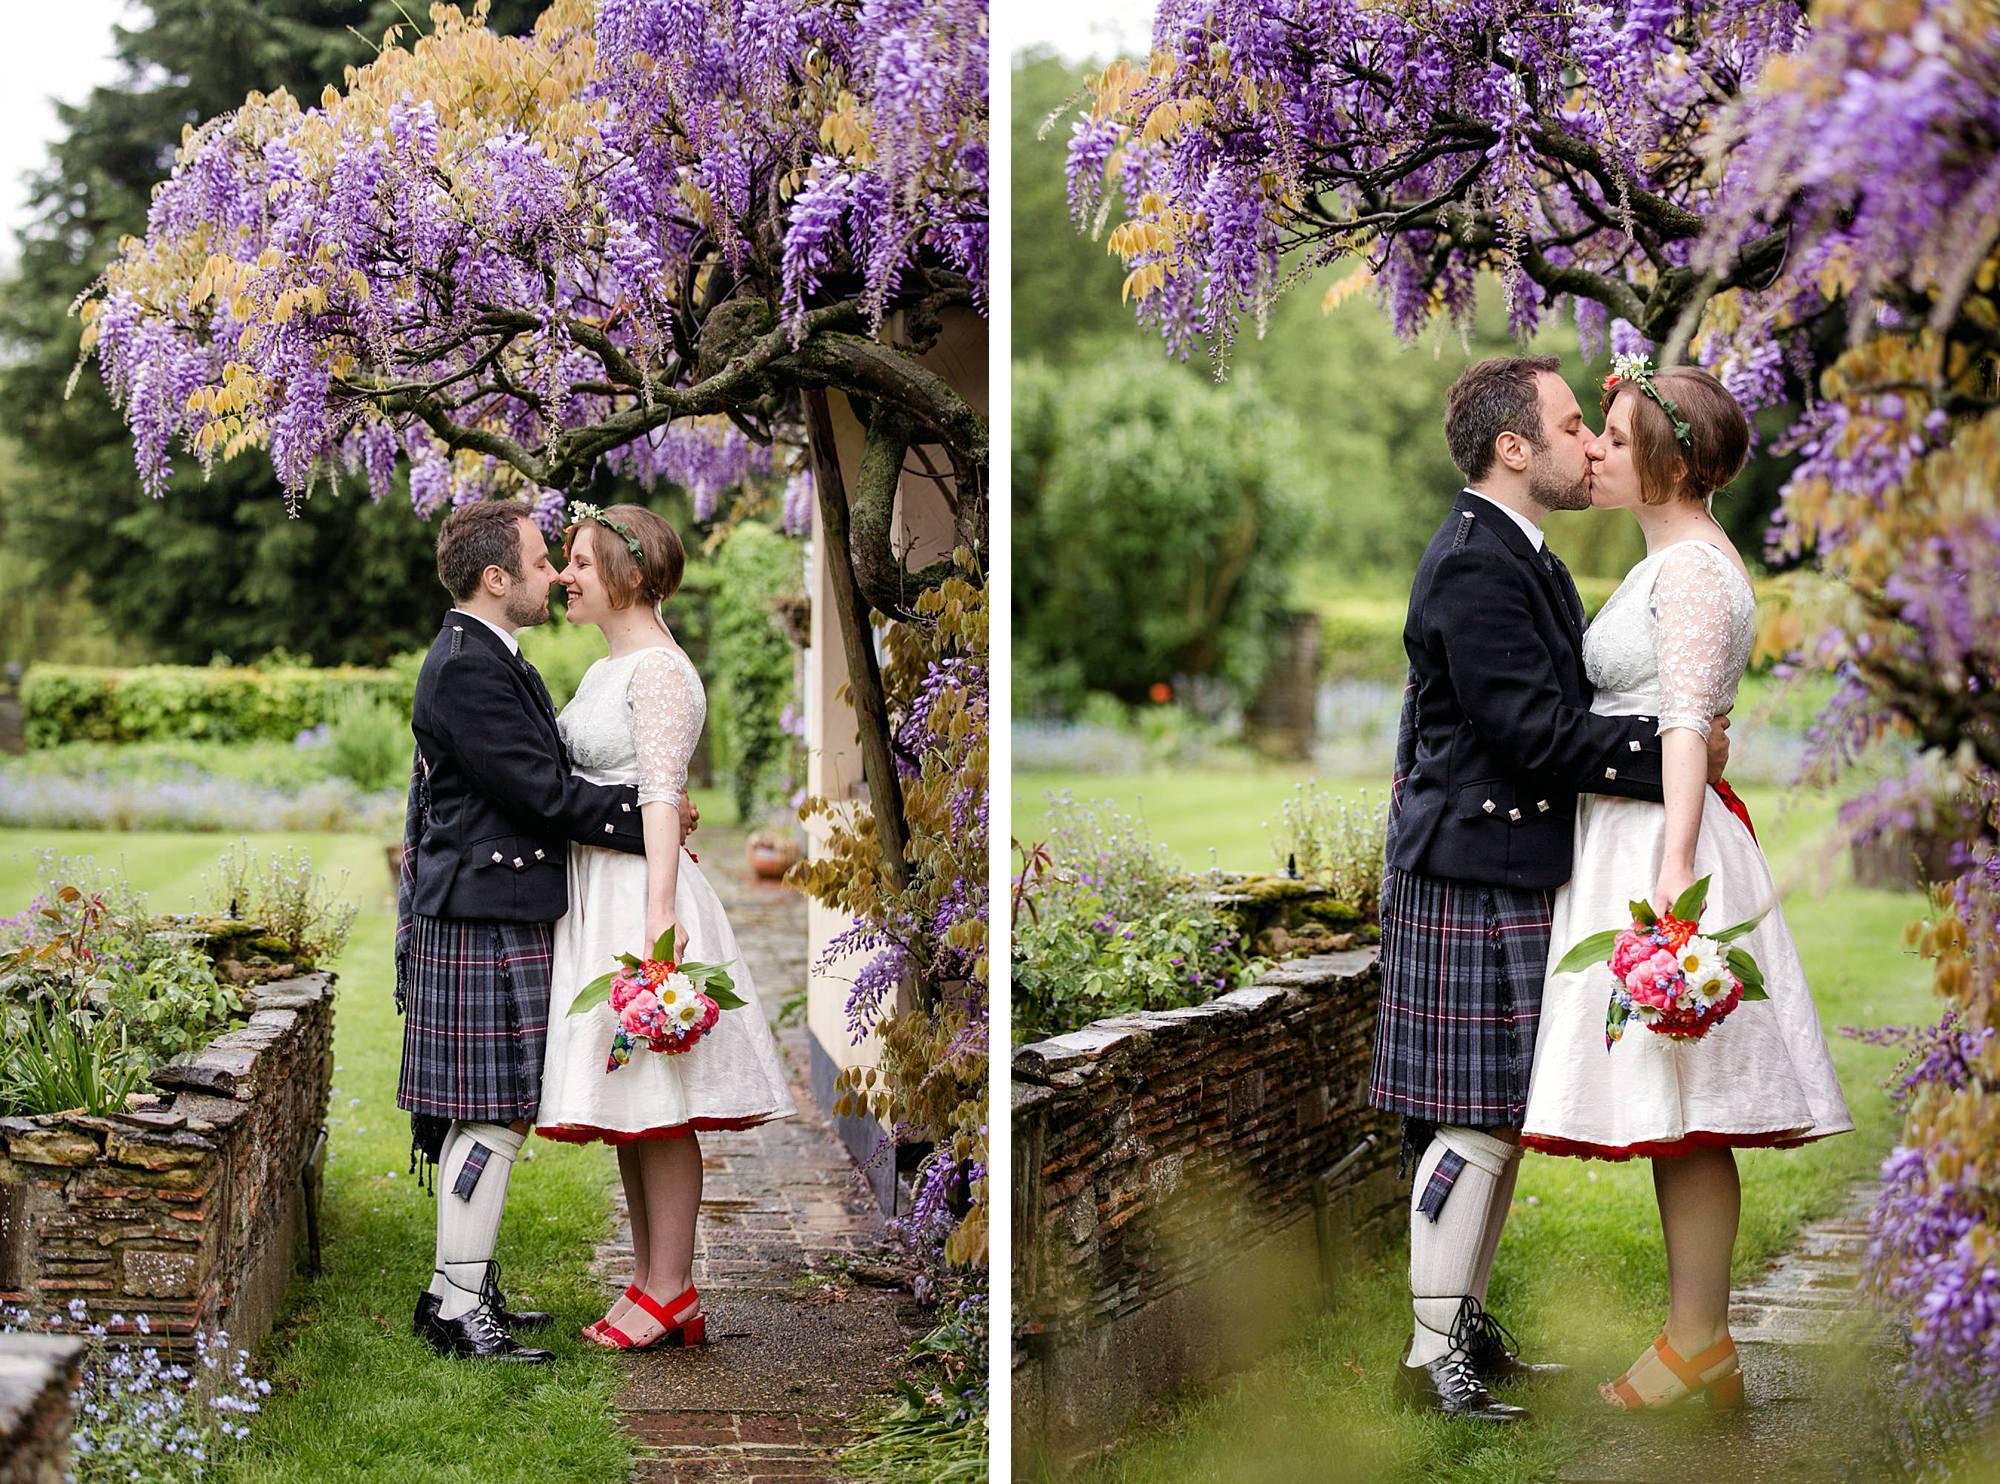 bride and groom kiss under wisteria wt Fun DIY wedding